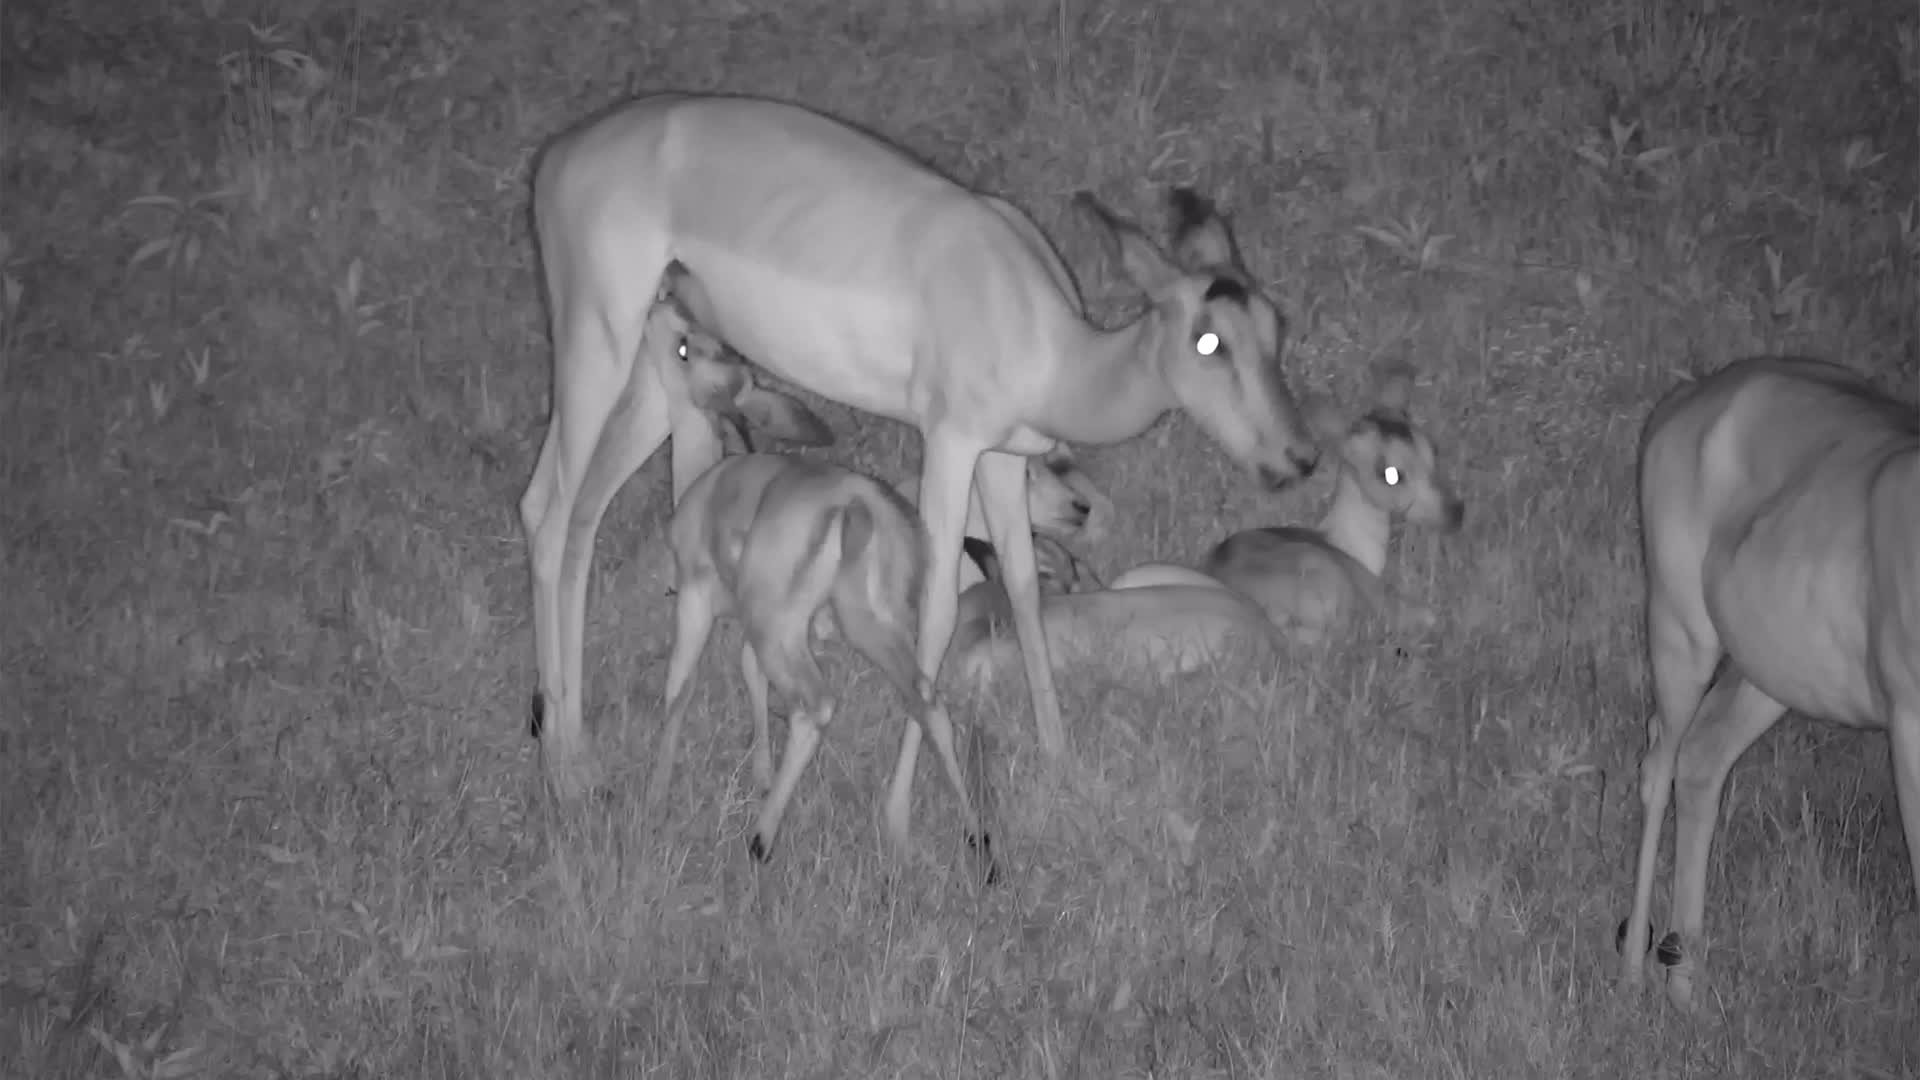 VIDEO:  Baby Impala feeding